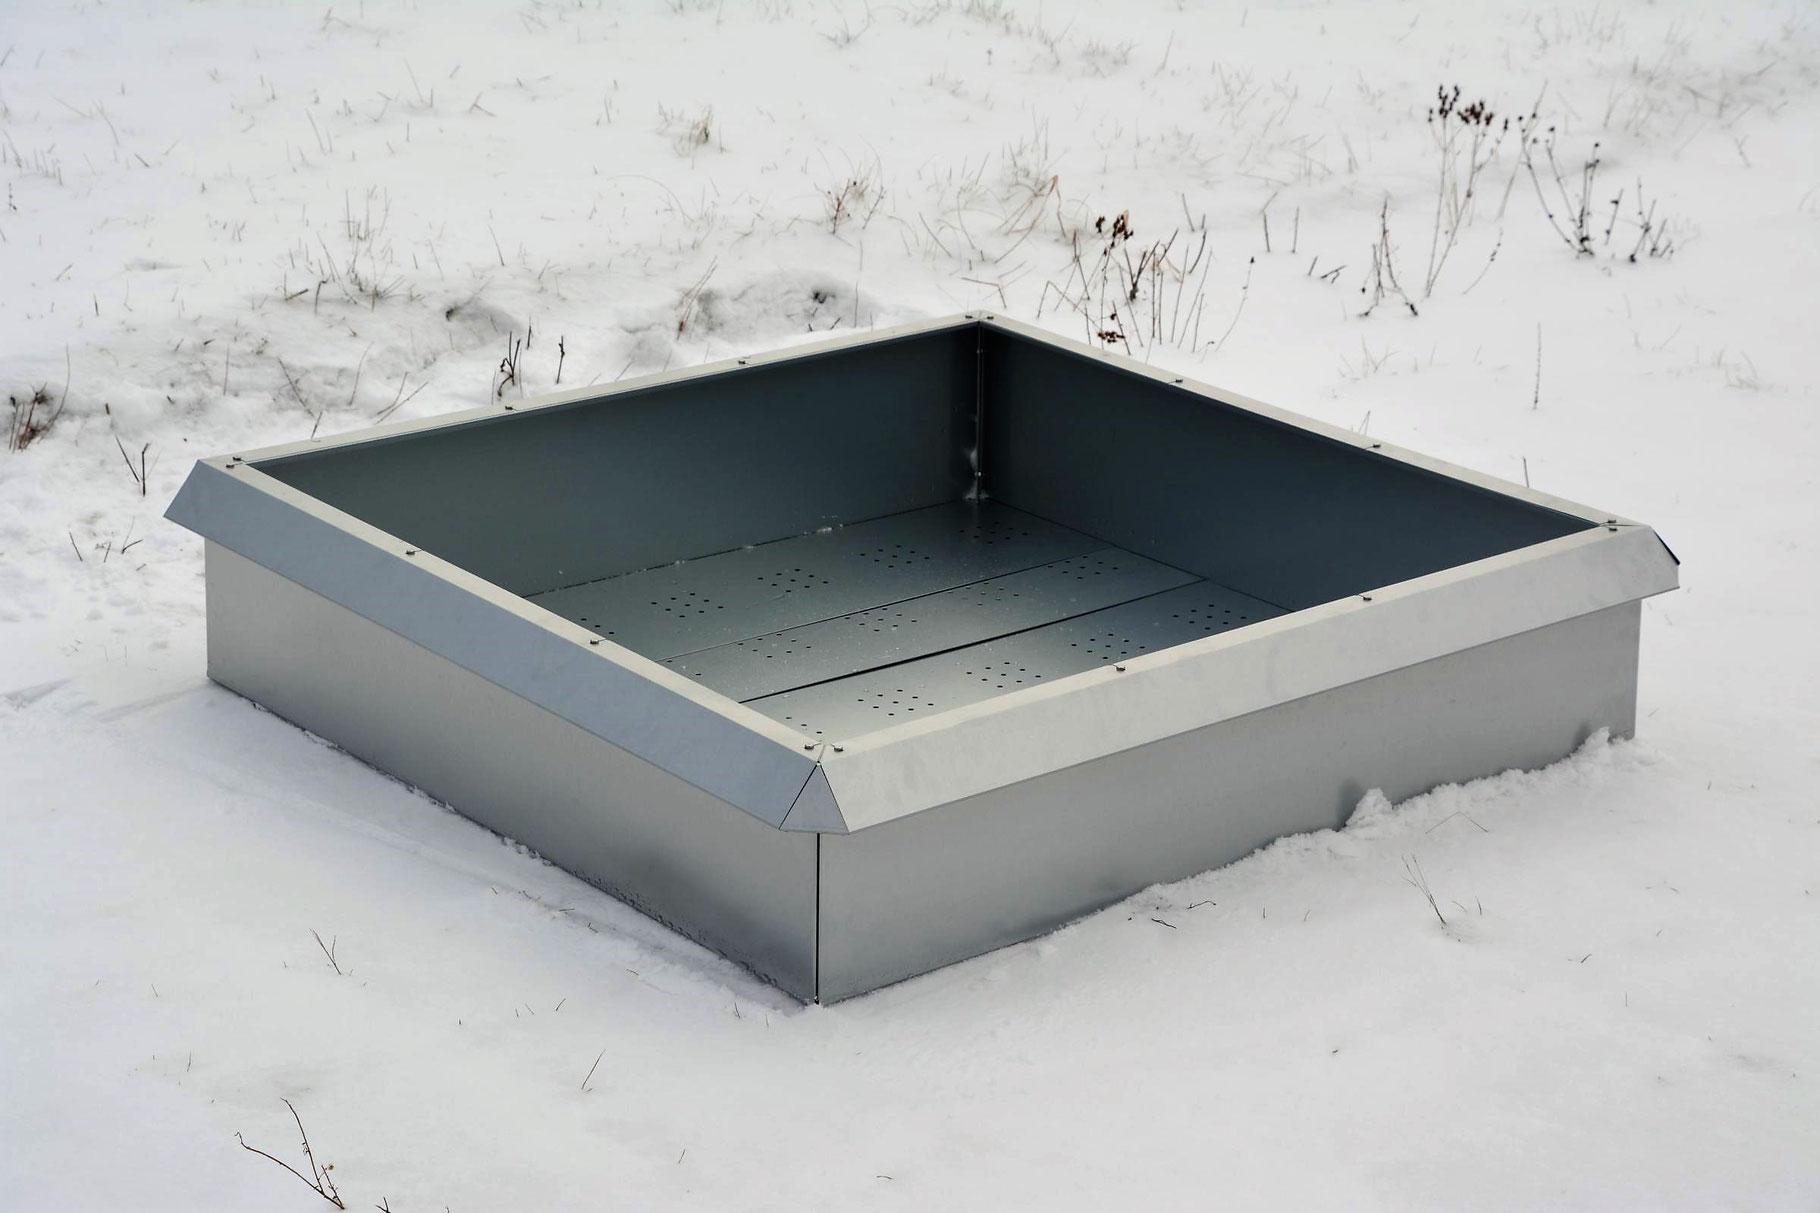 Hochbeet 1x1 Meter Von Metallmoebel24